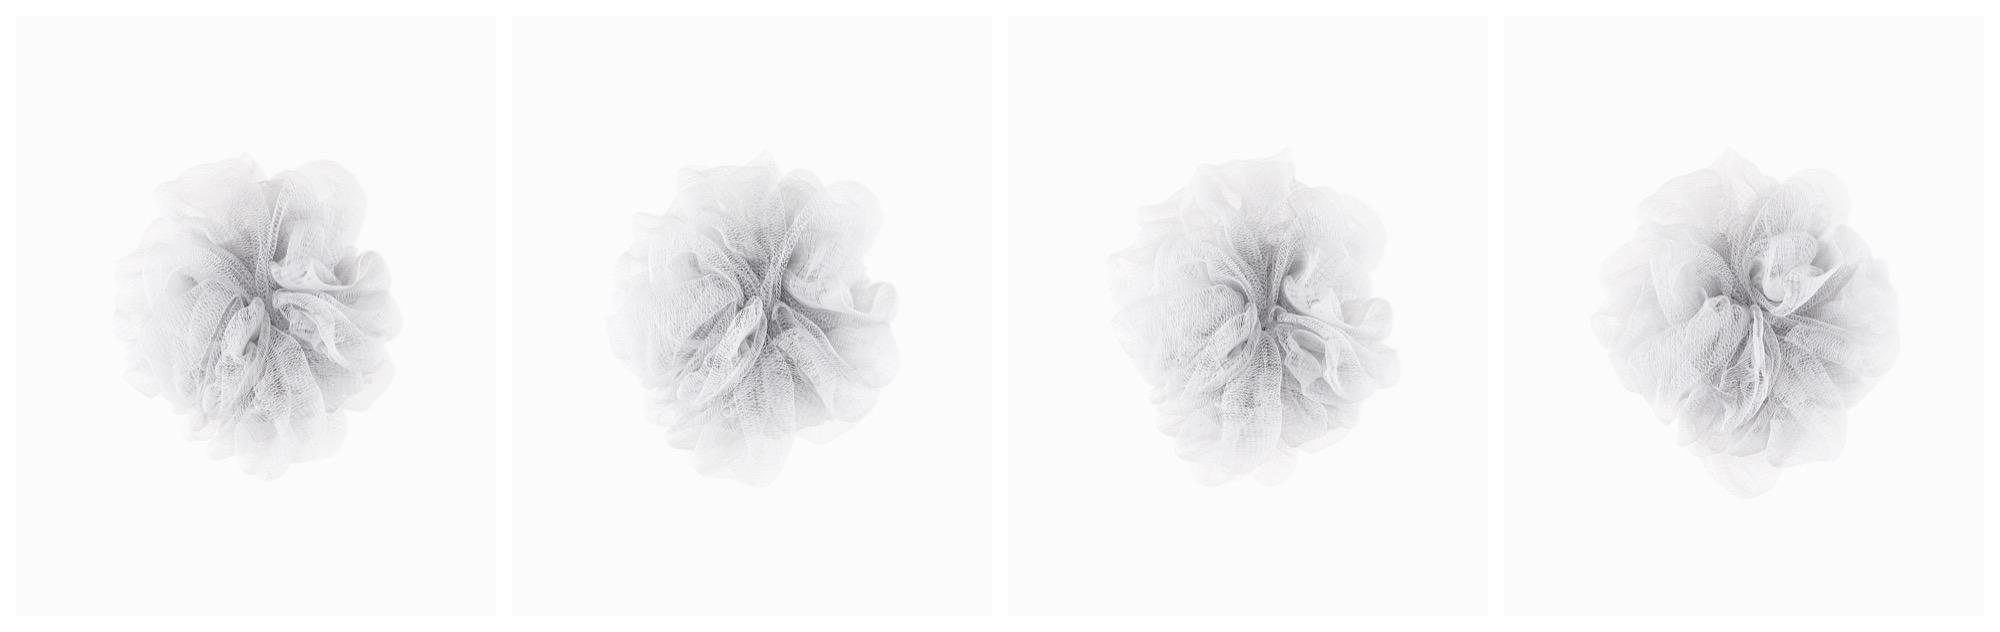 Shower ball 01~04, Digital Pigment Print, 39 x 32 cm, 2016